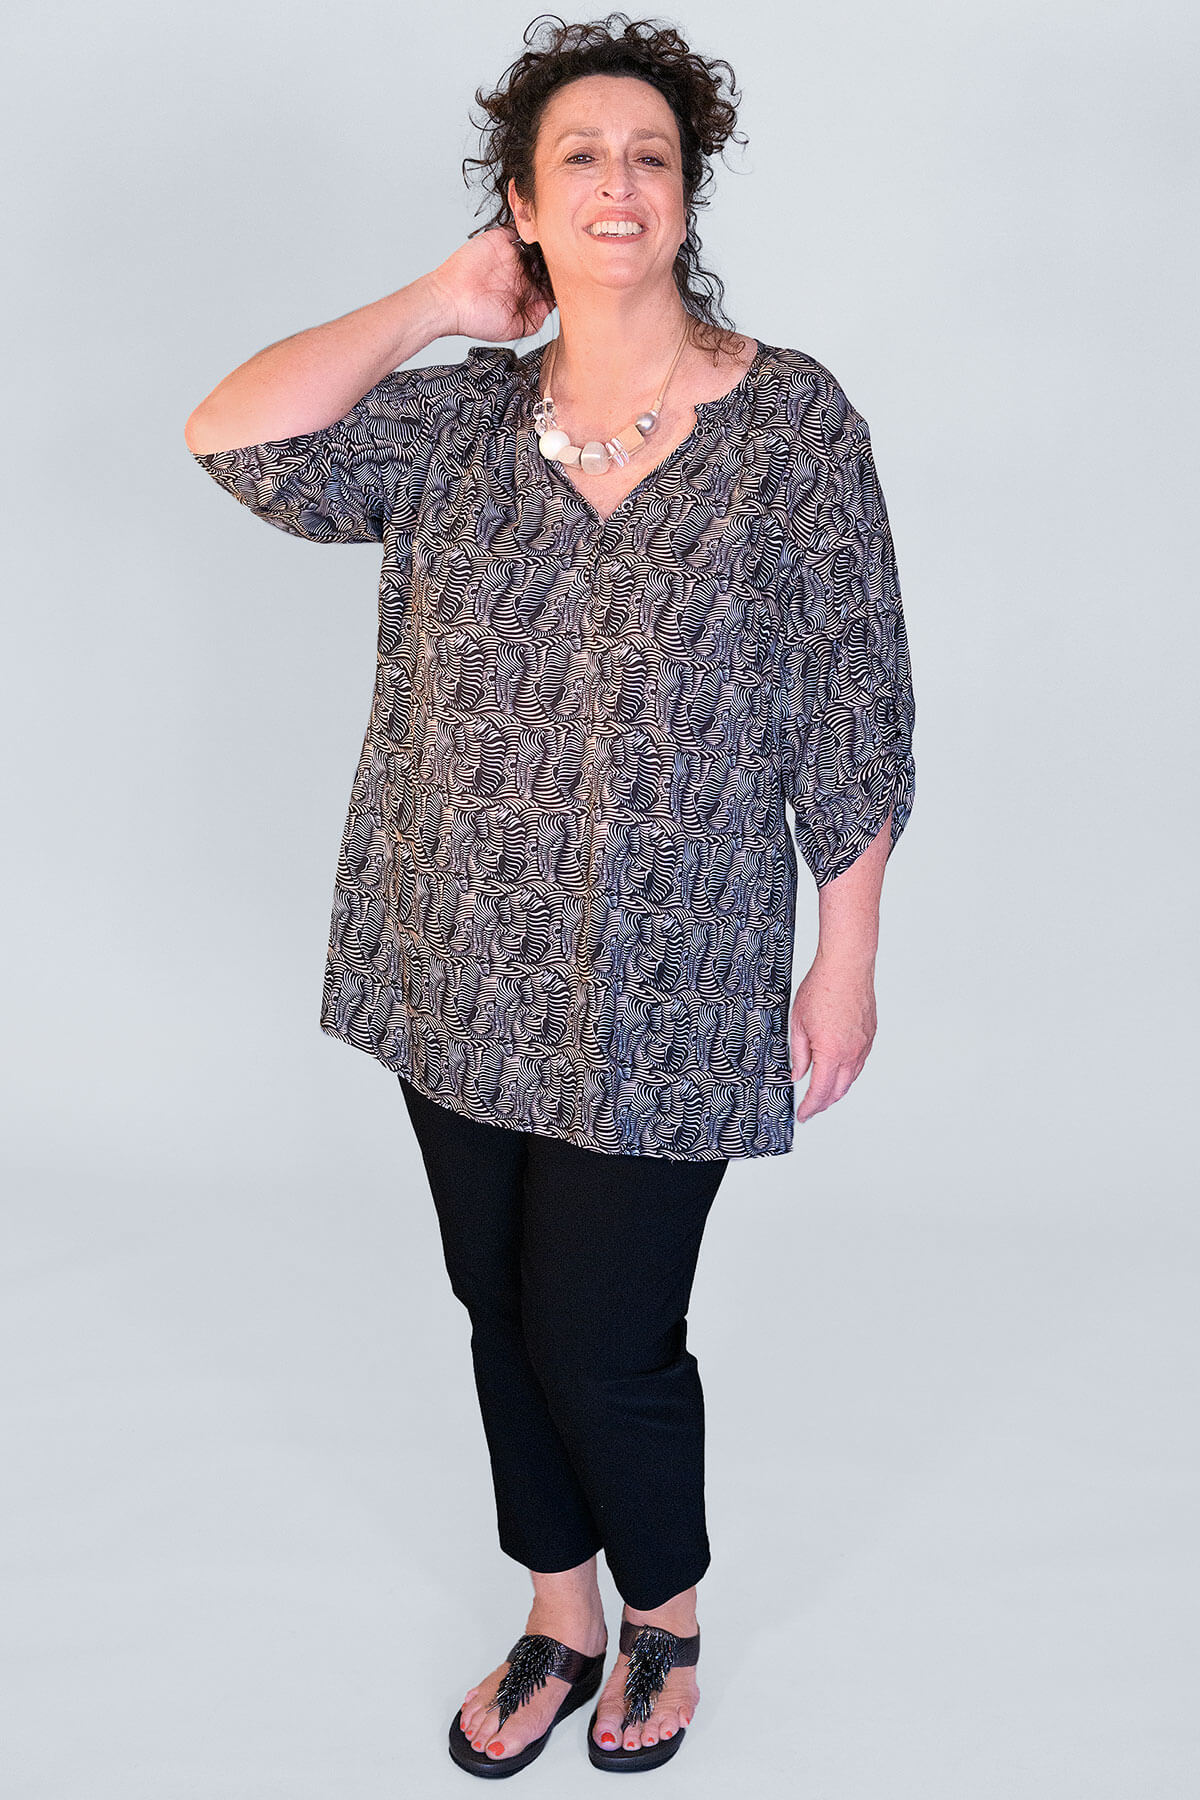 Doris Streich squiggle tunic